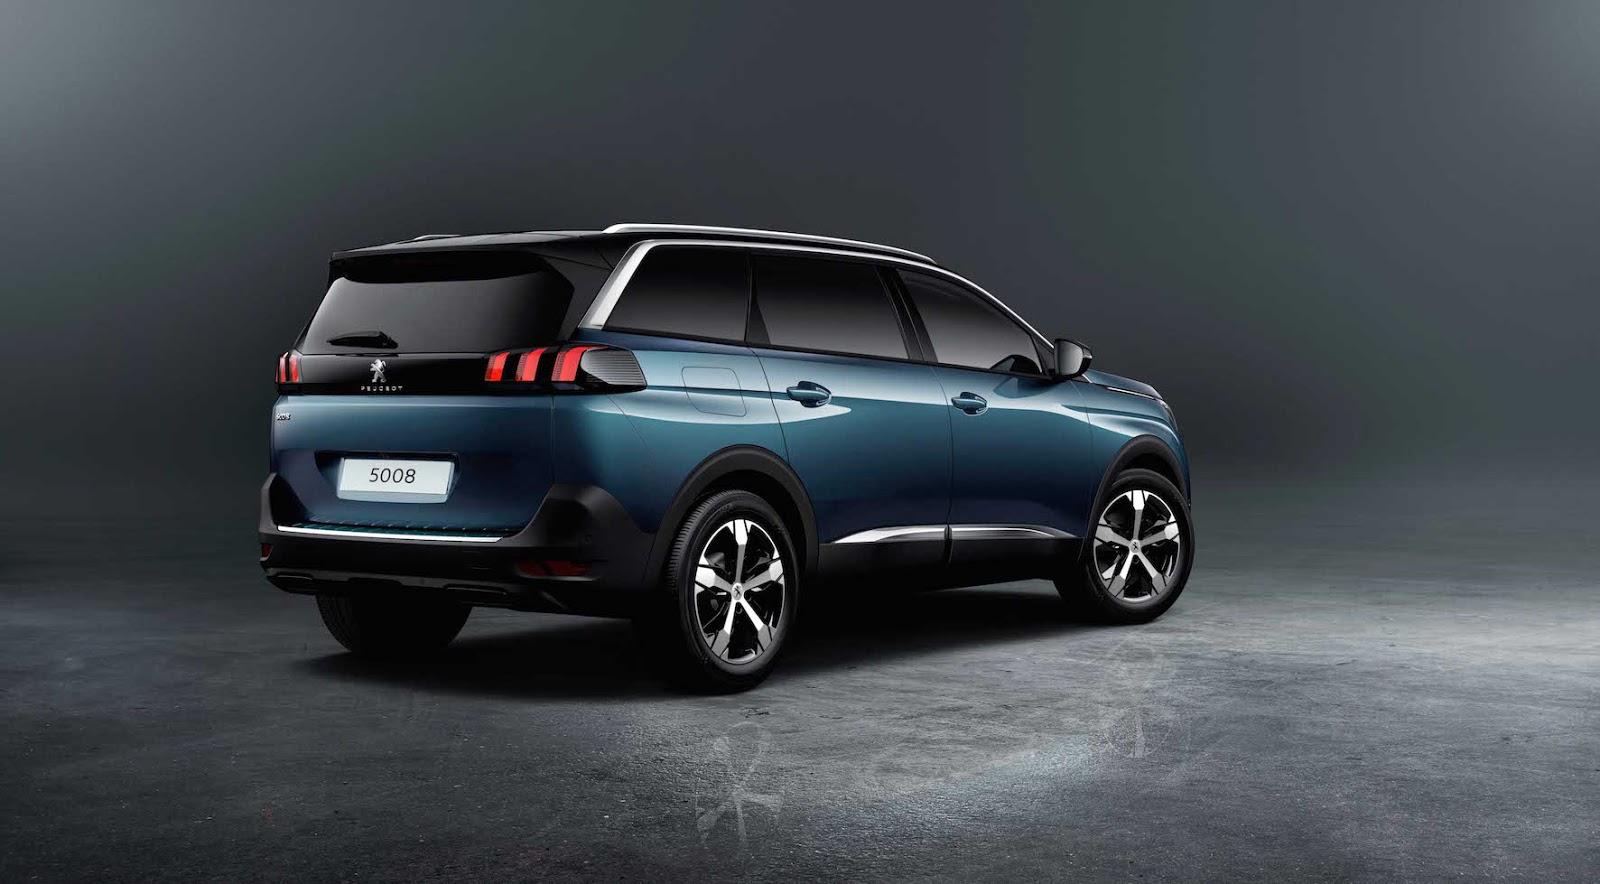 Smeg Kühlschrank Disney : Peugeot bringt den 5008 im frühjahr 2017 fahrspass24